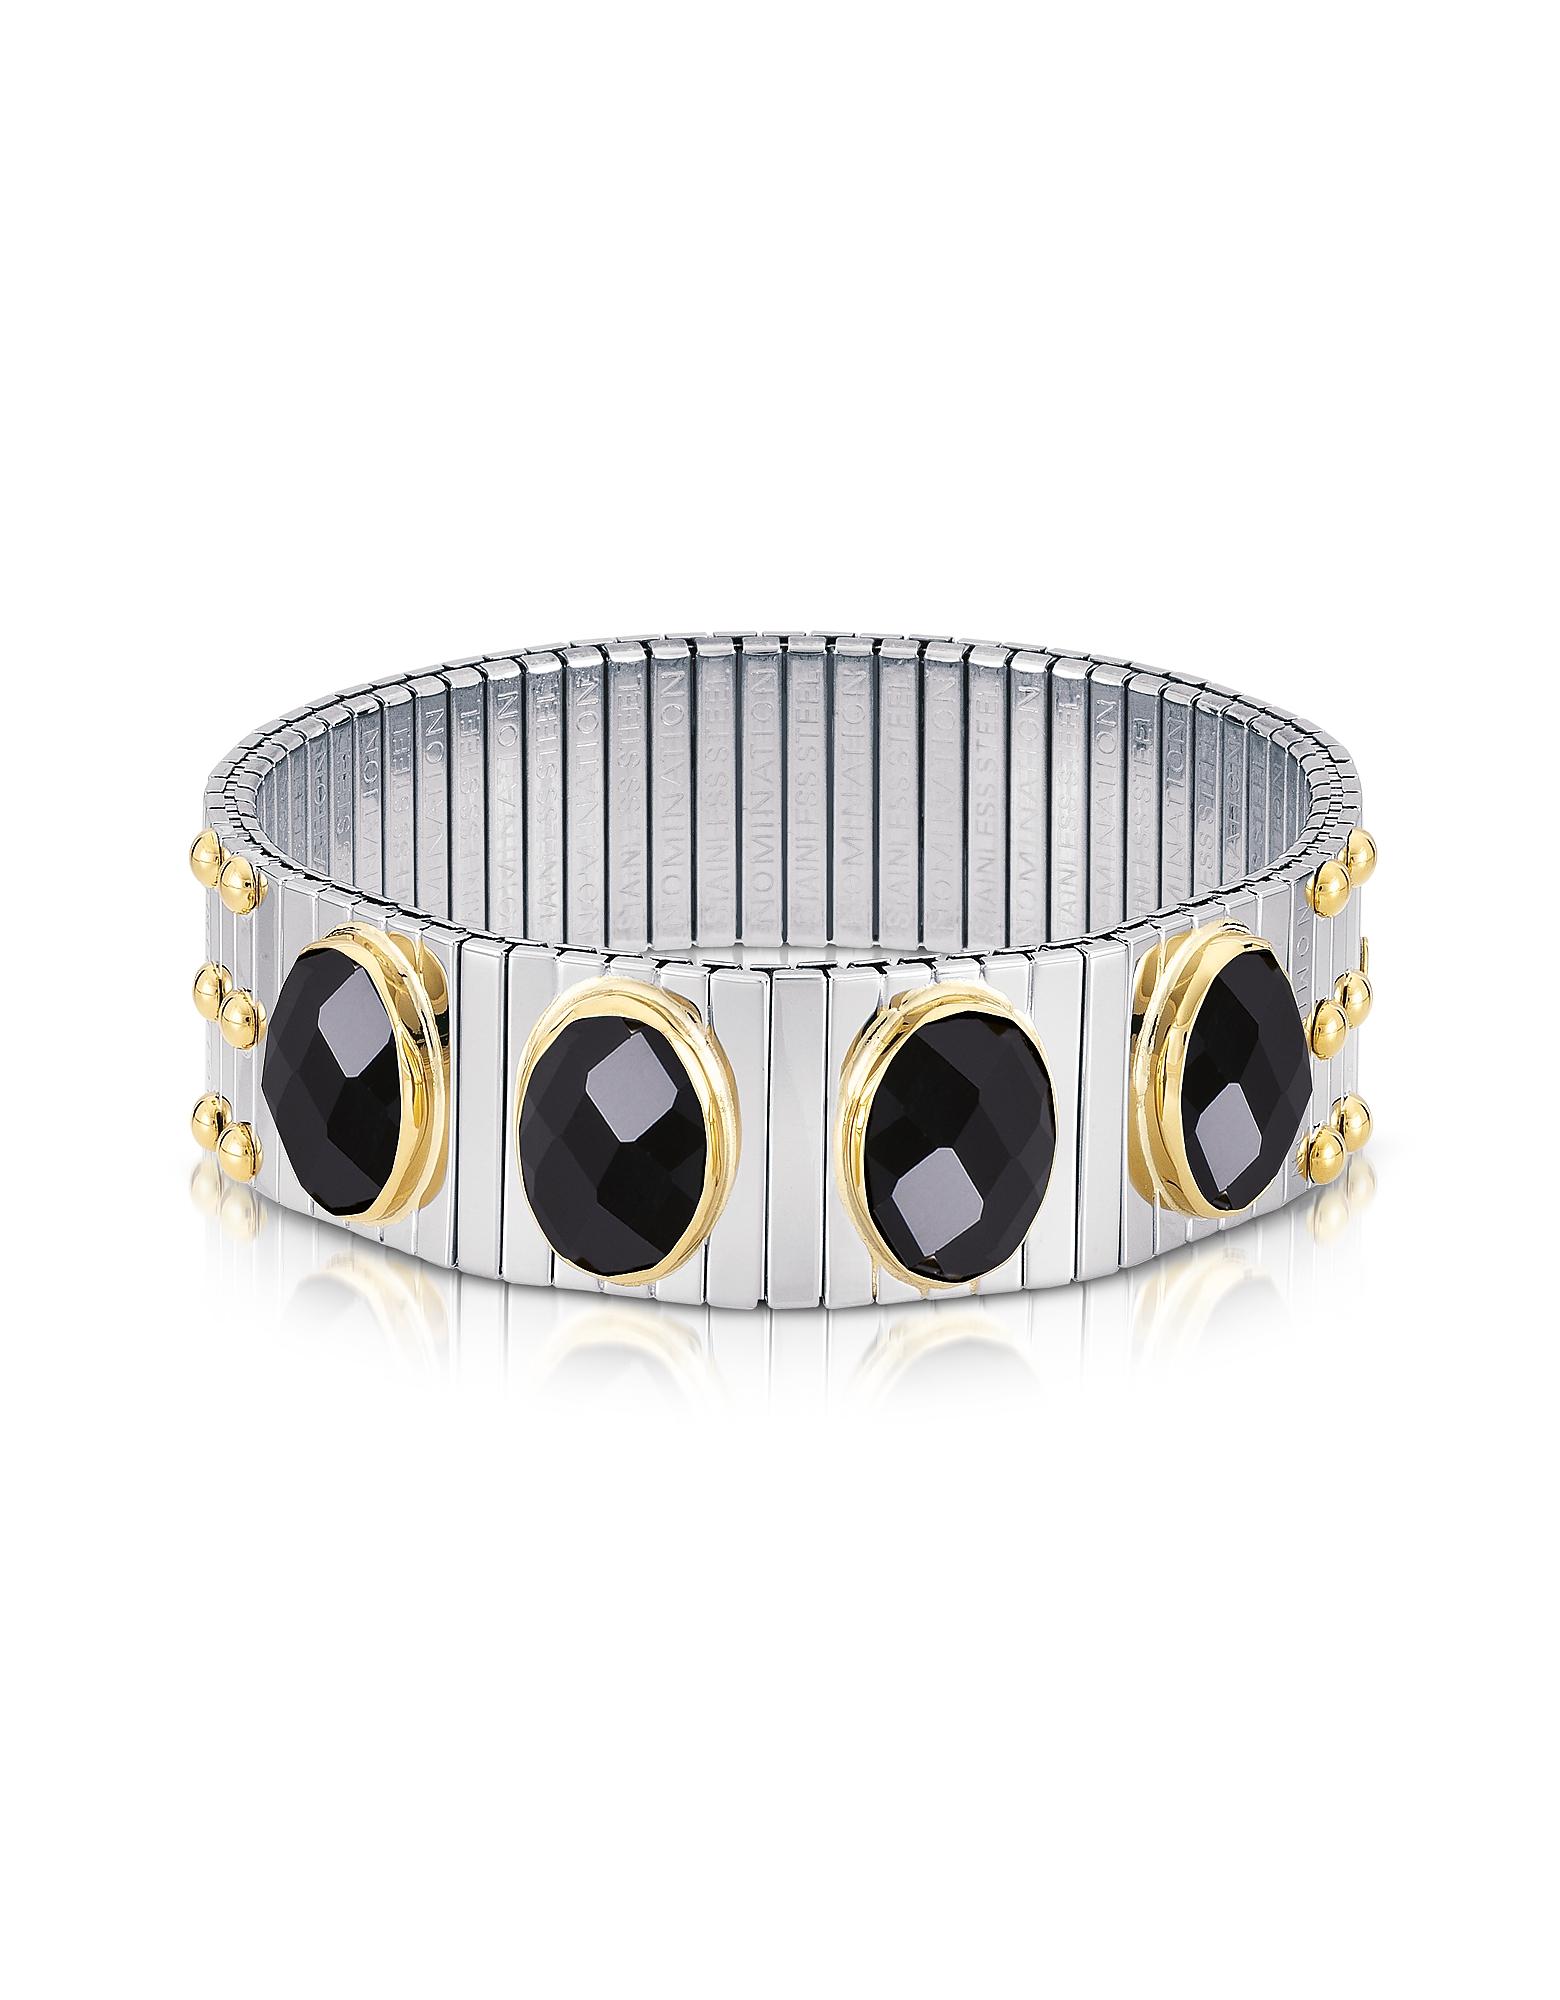 Nomination Bracelets, Four Black Cubic Zirconia Stainless Steel w/Golden Studs Women's Bracelet